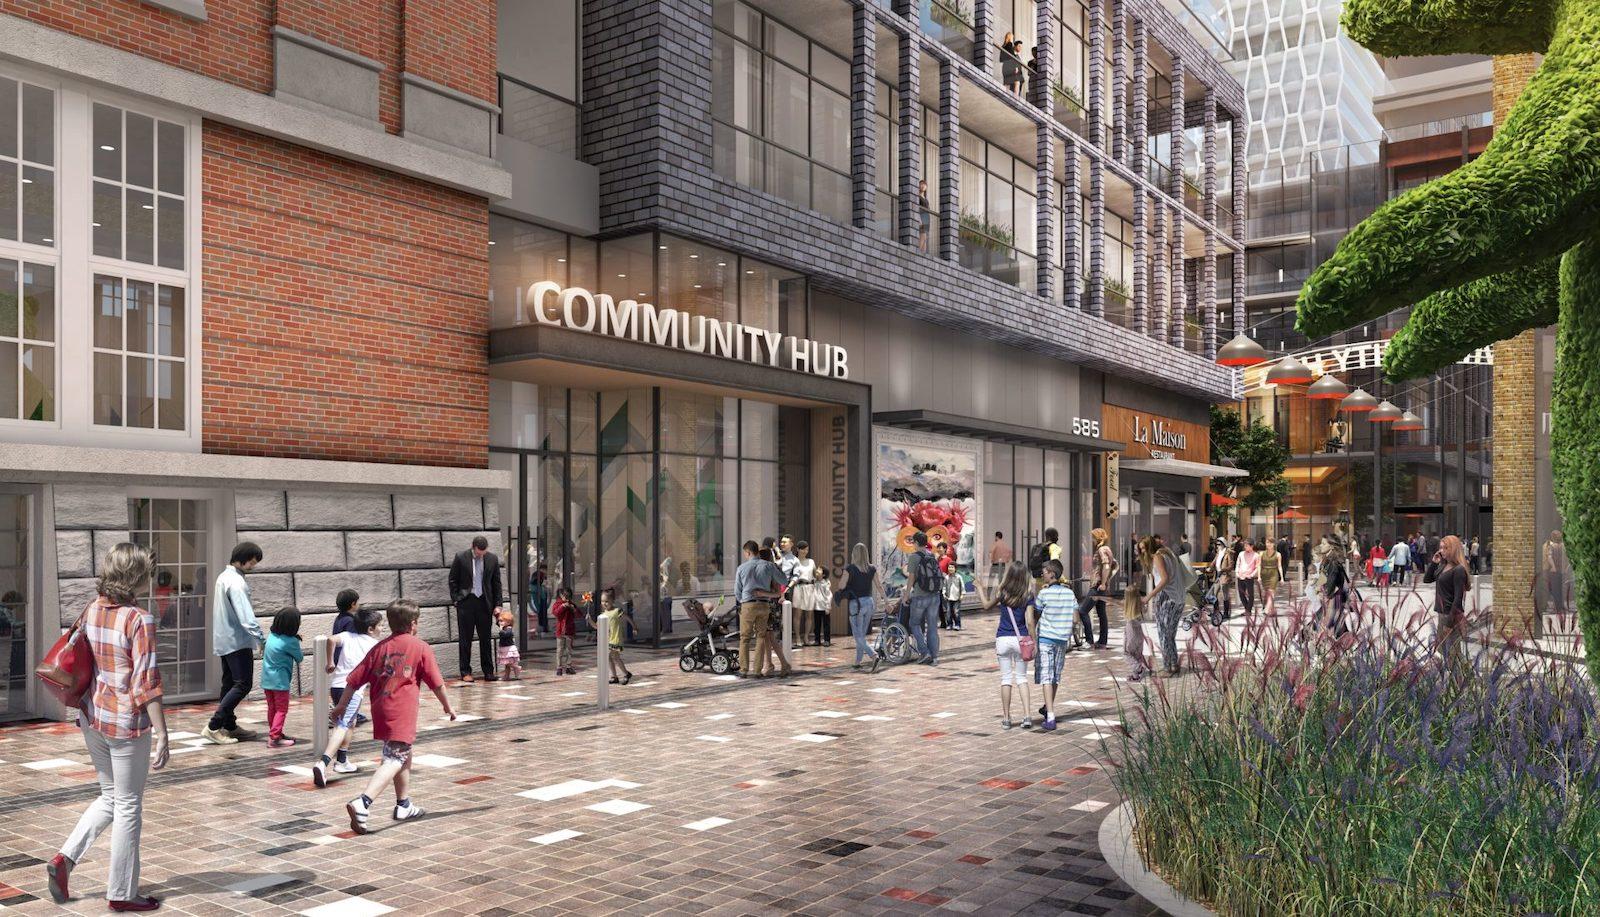 Bloor & Dufferin Condos Community Hub Rendering